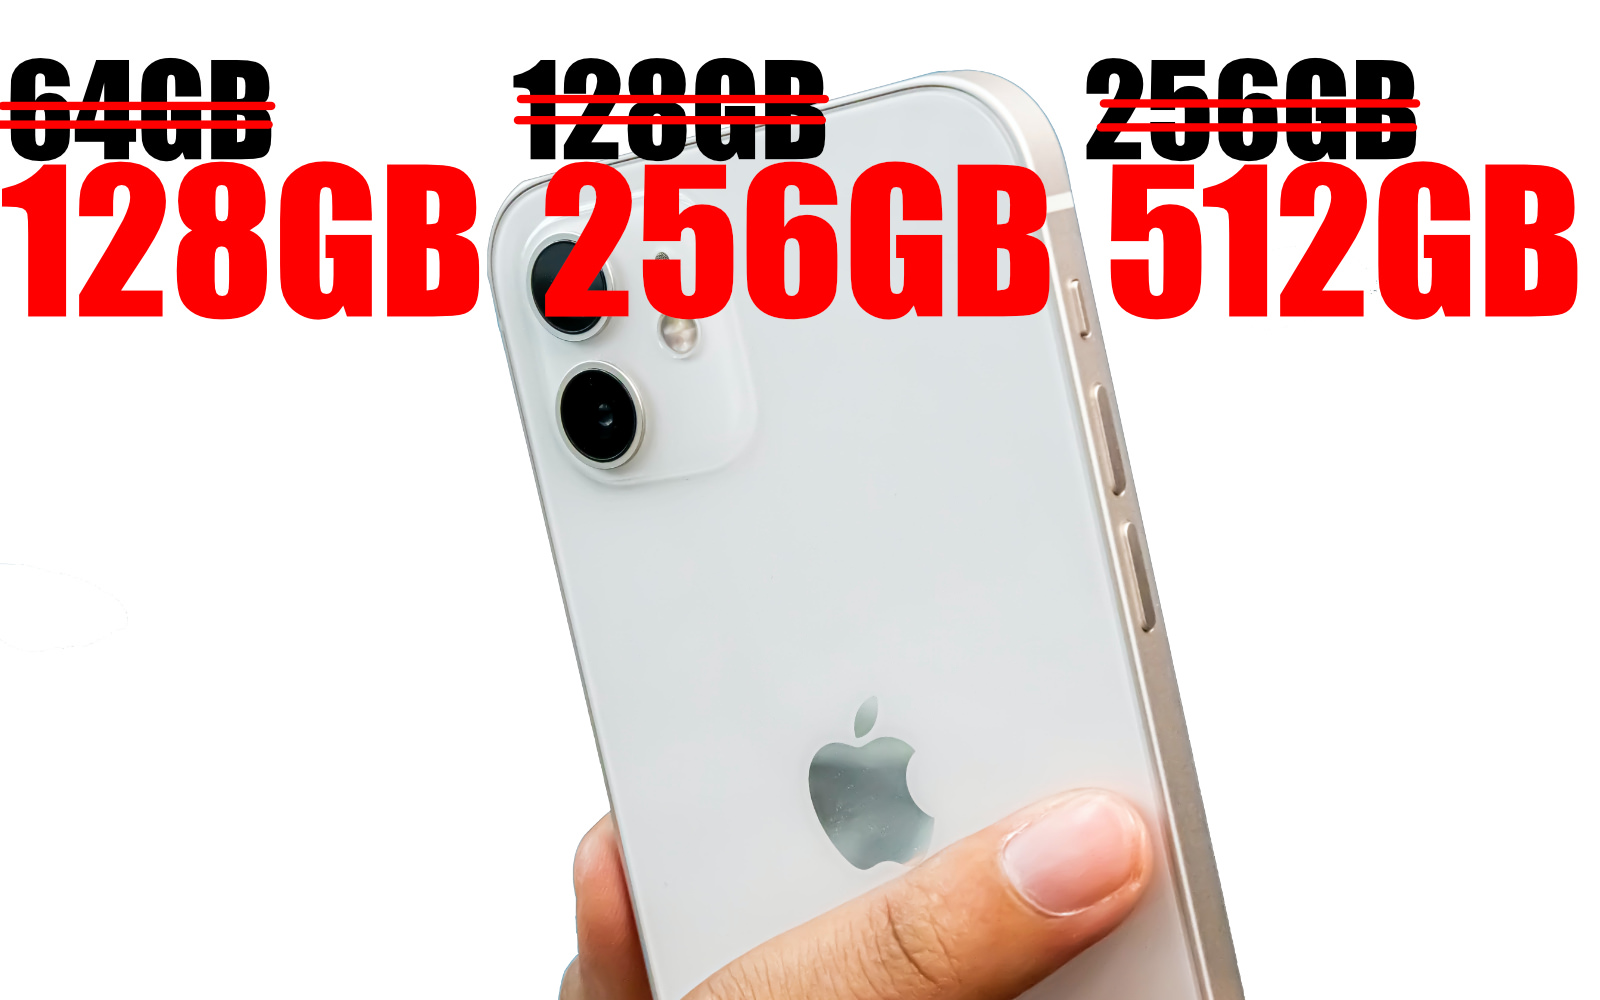 Iphone 13 13mini storage options